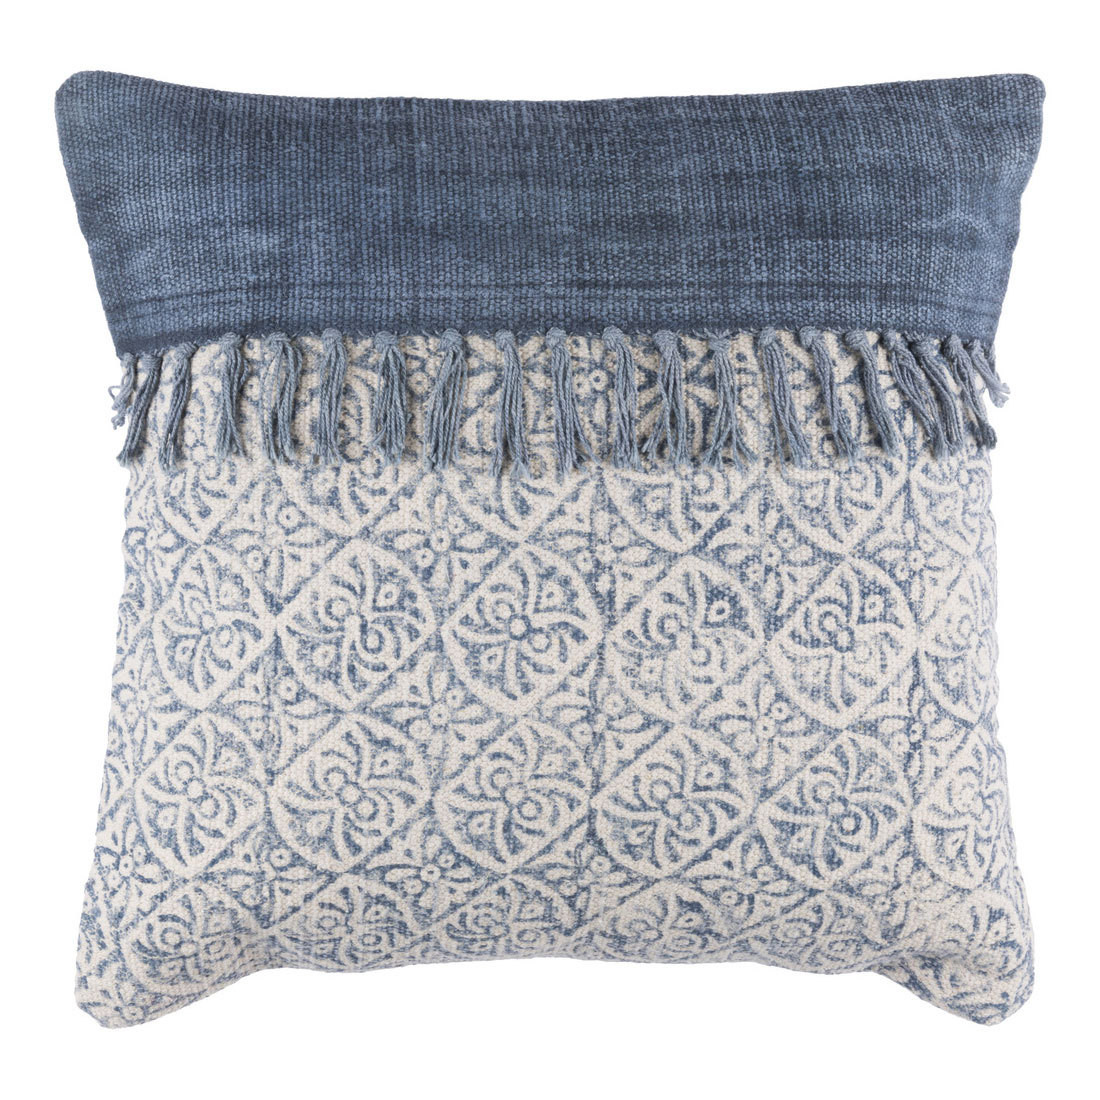 Hmong Moos Pillow - LL-005 20 x 20 inches Cotton